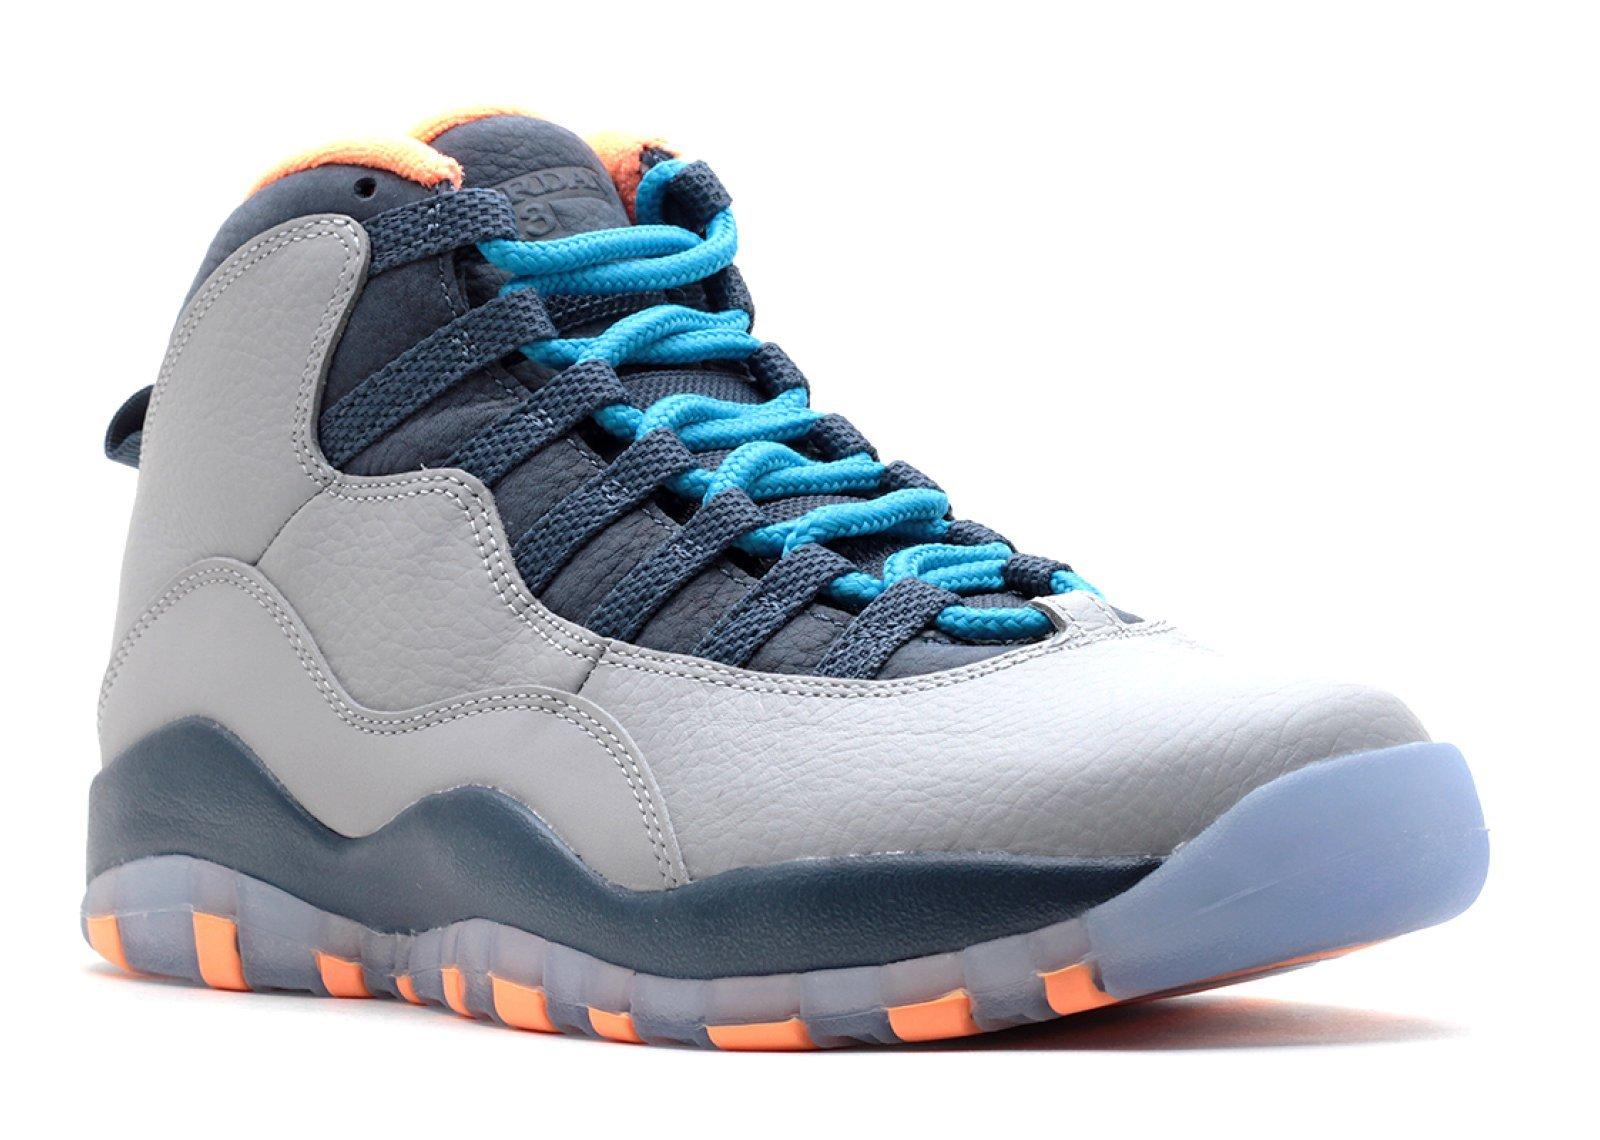 Air Jordan Retro 10 ''Bobcats'' (TD) Baby Toddlers Basketball Shoes Wolf Grey/Dark Powder Blue-New Salt 310808-026 (7.5 M US)